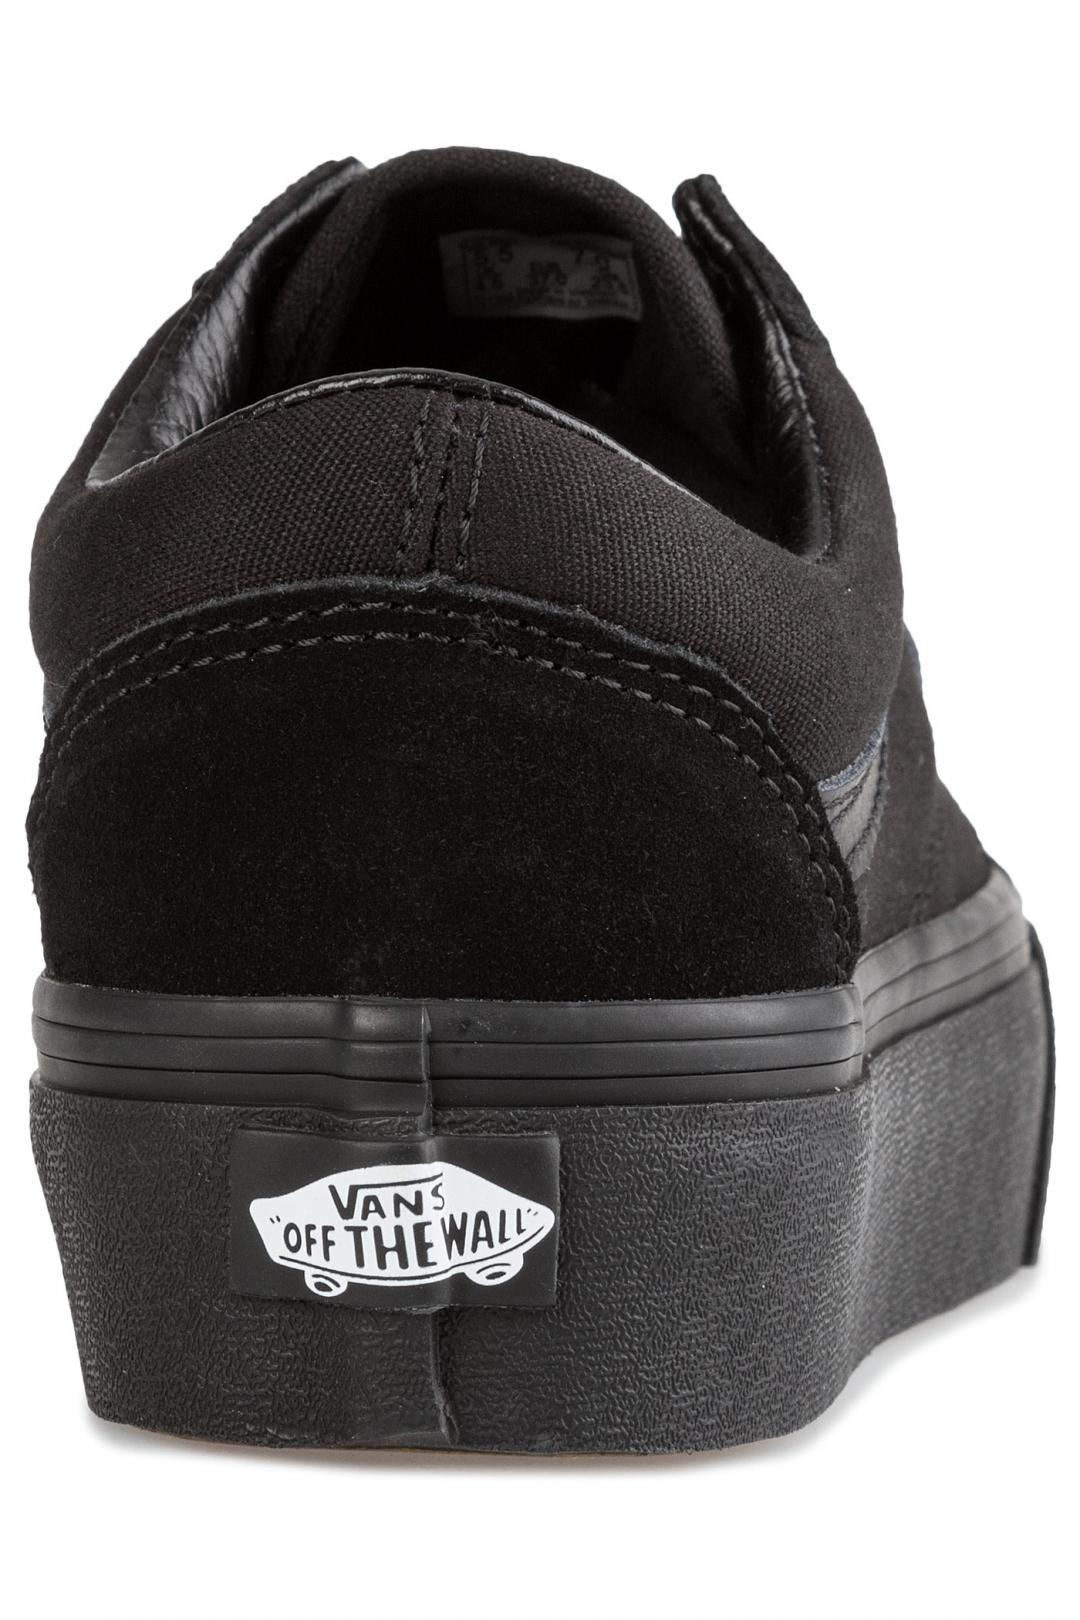 Donna Vans Old Skool Platform black black | Scarpe da skate